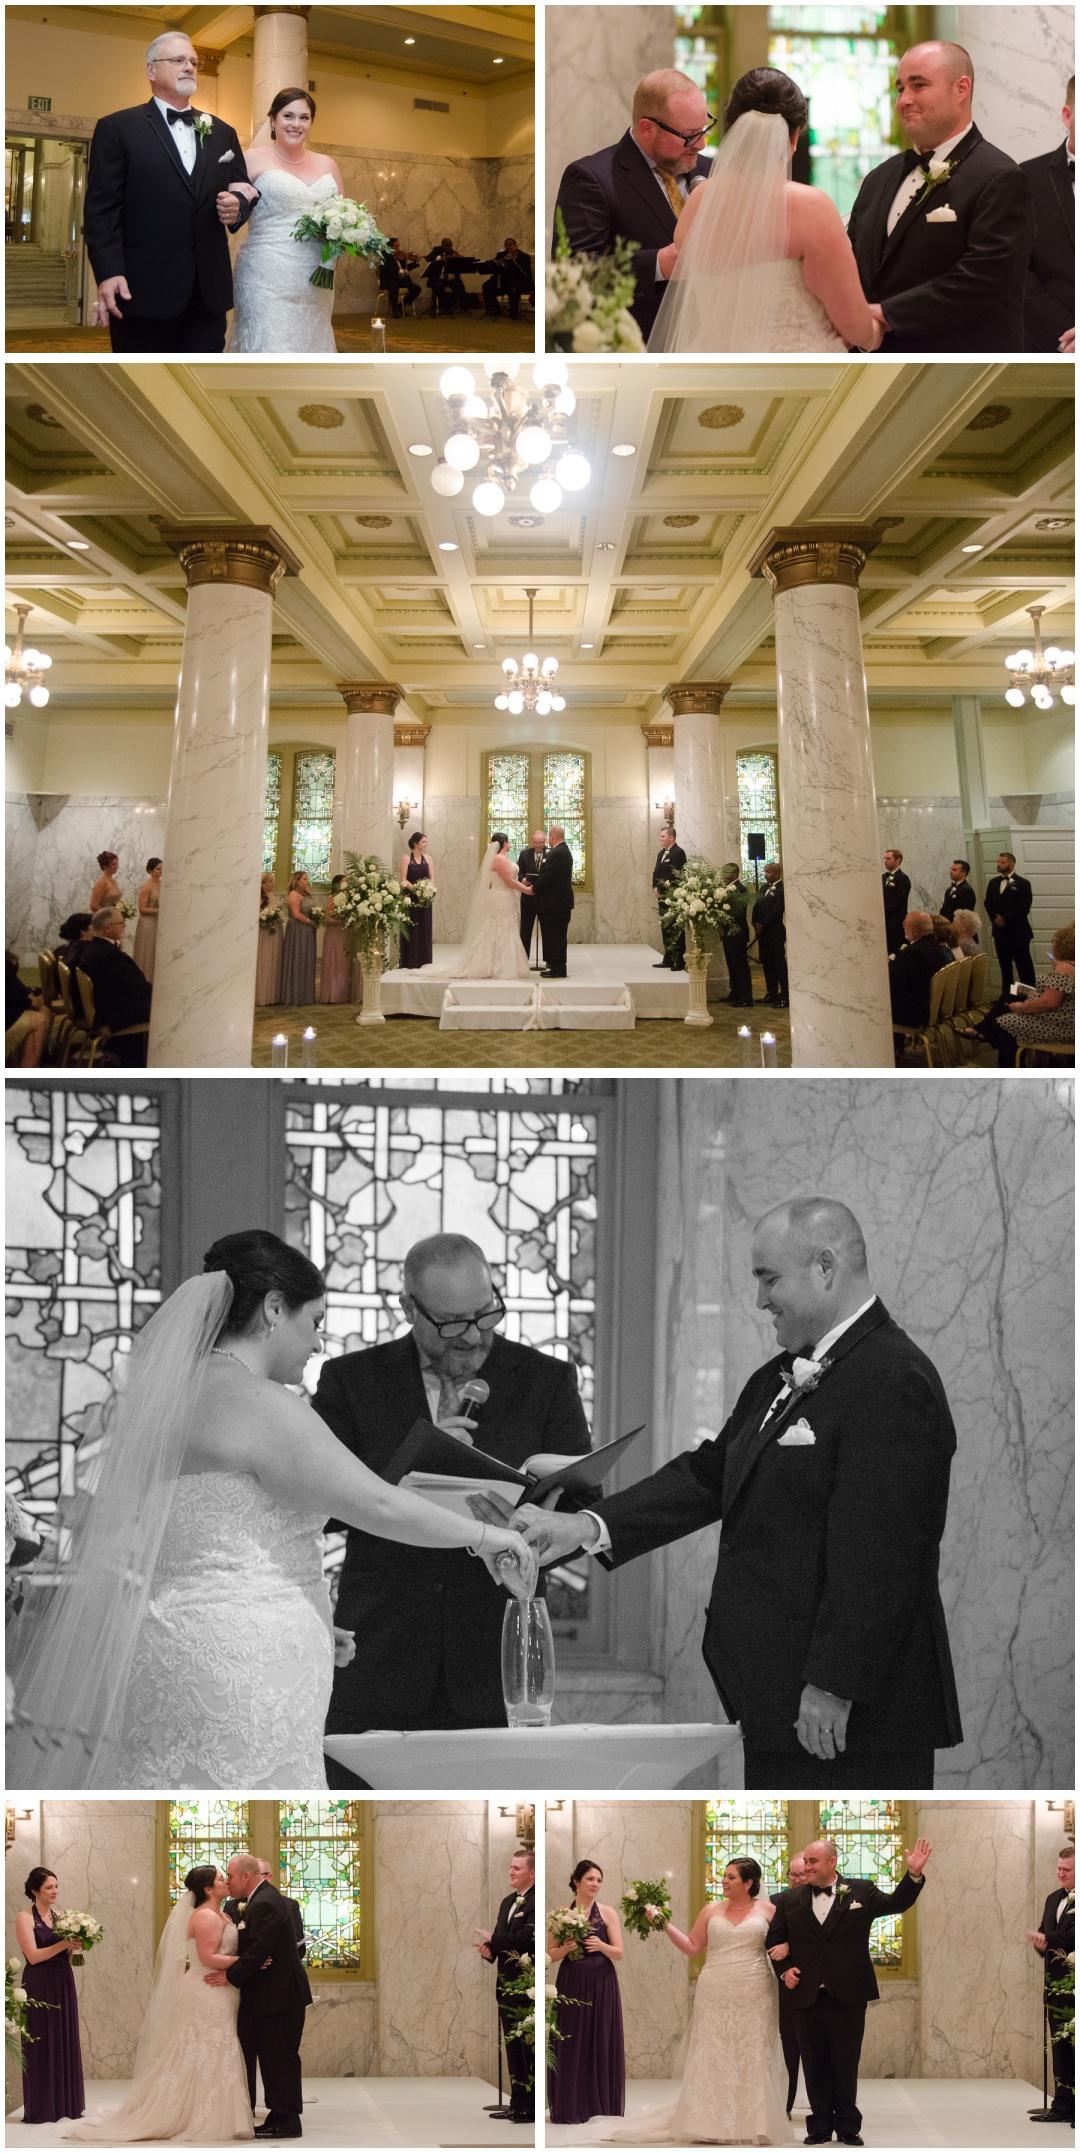 The-Grand-Wedding-Photos-Aaron-Haslinger-Photography_0007.jpg